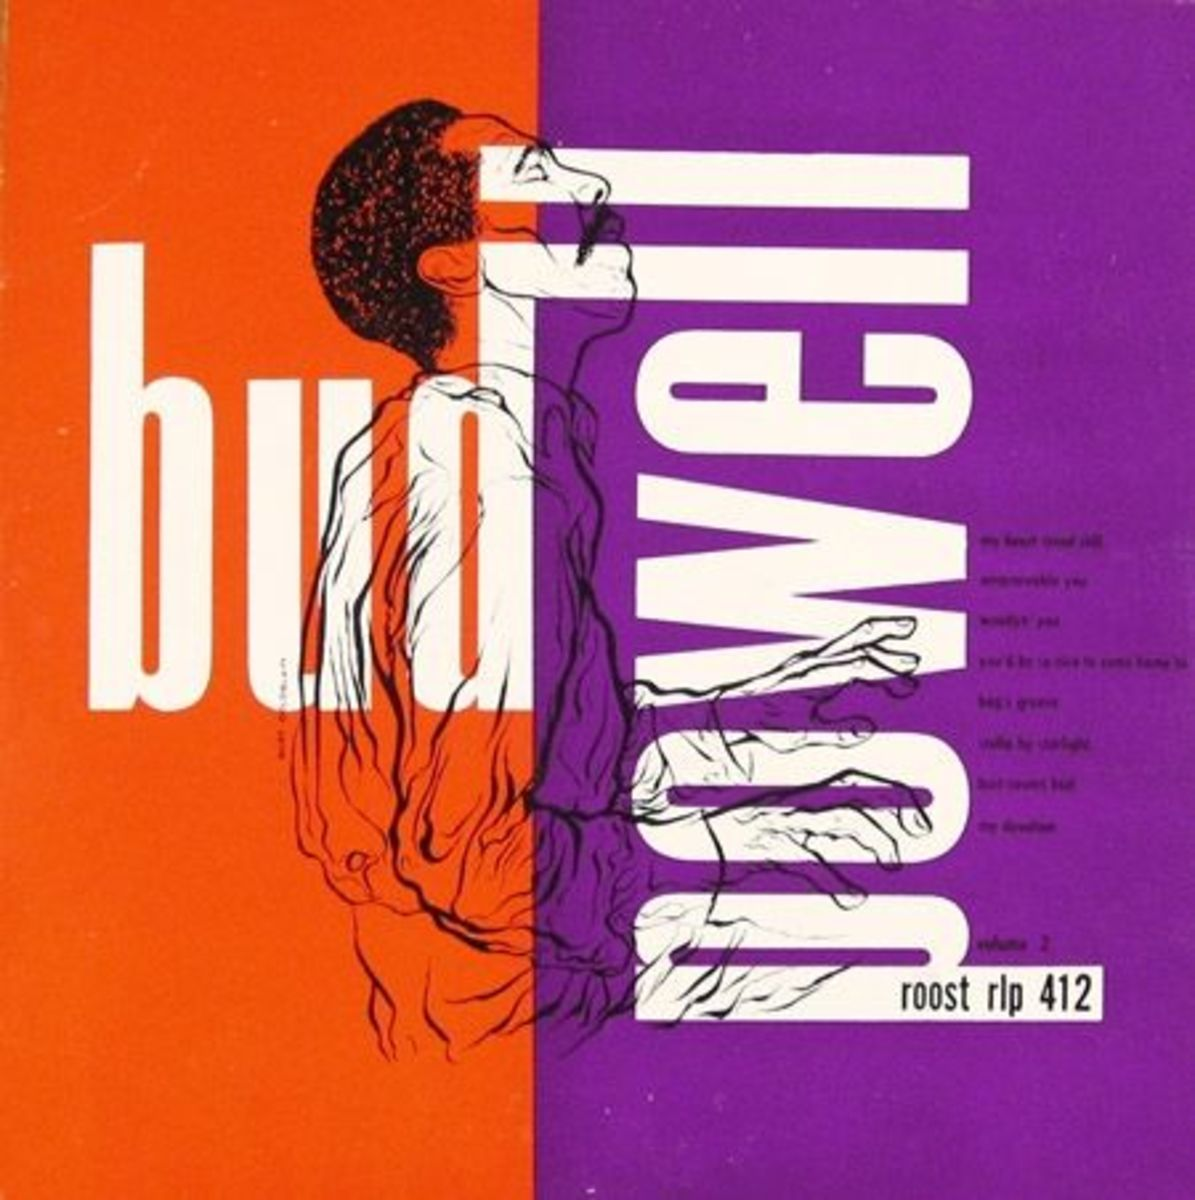 "Bud Powell ""The Bud Powell Trio Vol 2"" Roost Records 412 10"" LP Vinyl Record (1953) Album Cover Art & Design by Burt Goldblatt"